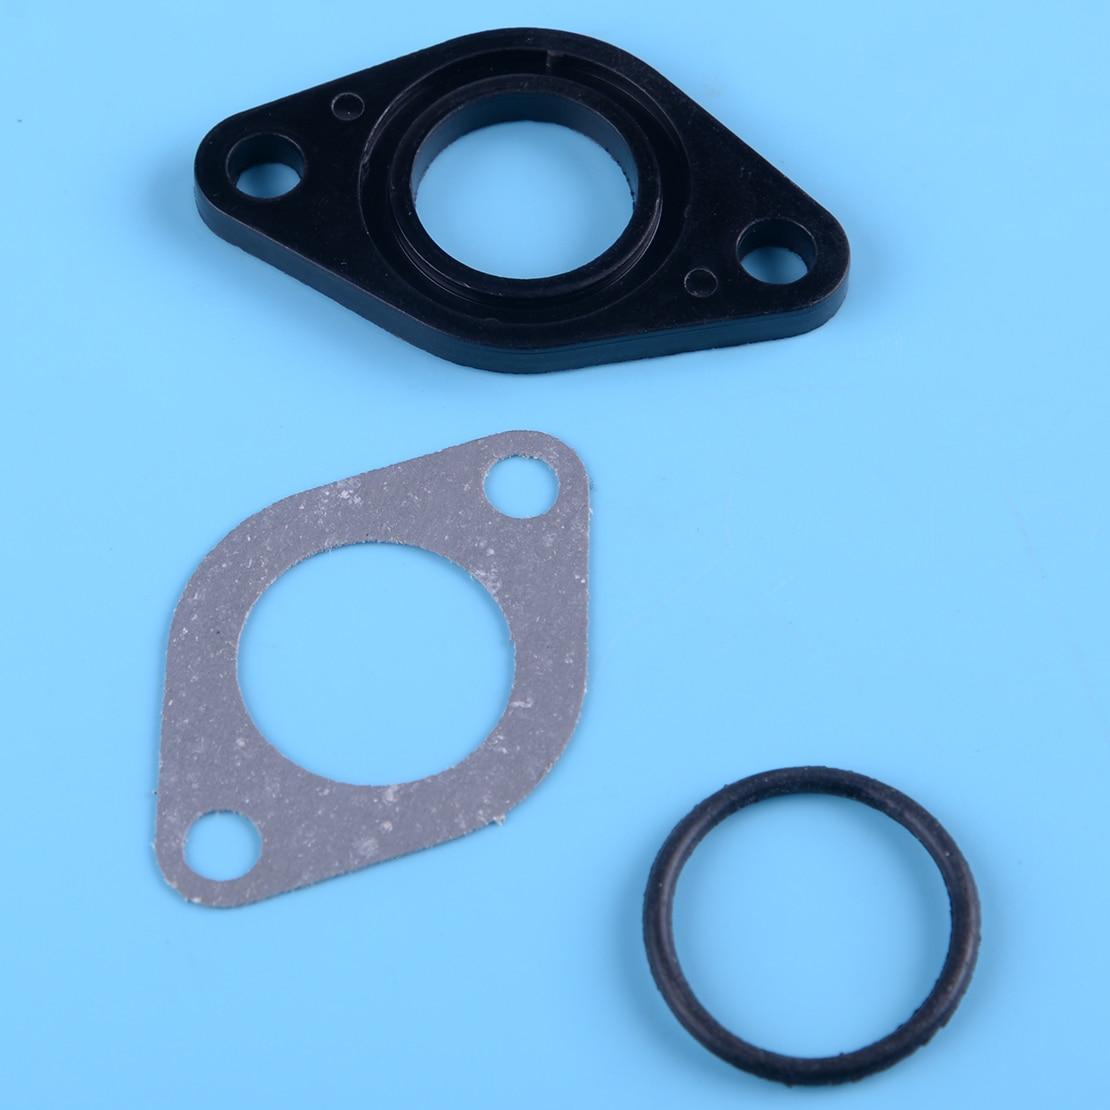 CITALL 1 Set Of 26mm Carburetor Spacer Carb Gasket Intake Manifold Gasket Fit For Dirt Pit Bike 110cc 125cc 138cc